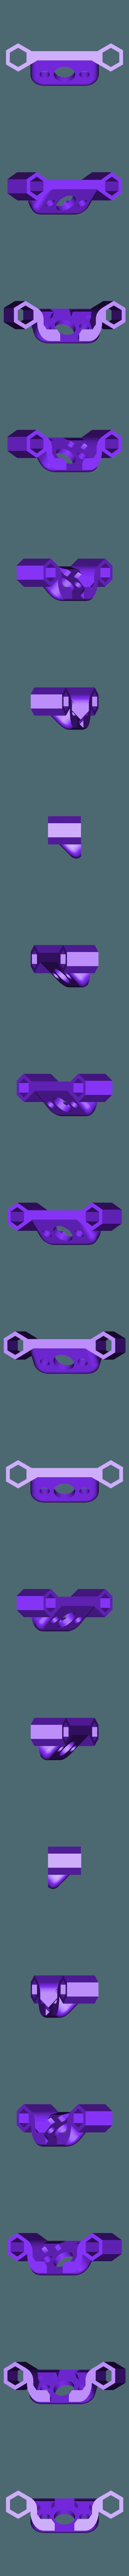 Alien_pigtail_45_holes.stl Download free STL file ALIEN 5 IMPULSE RC SUPPORT PIGTAIL (ALL TYPES) • 3D printable design, Rhizamax